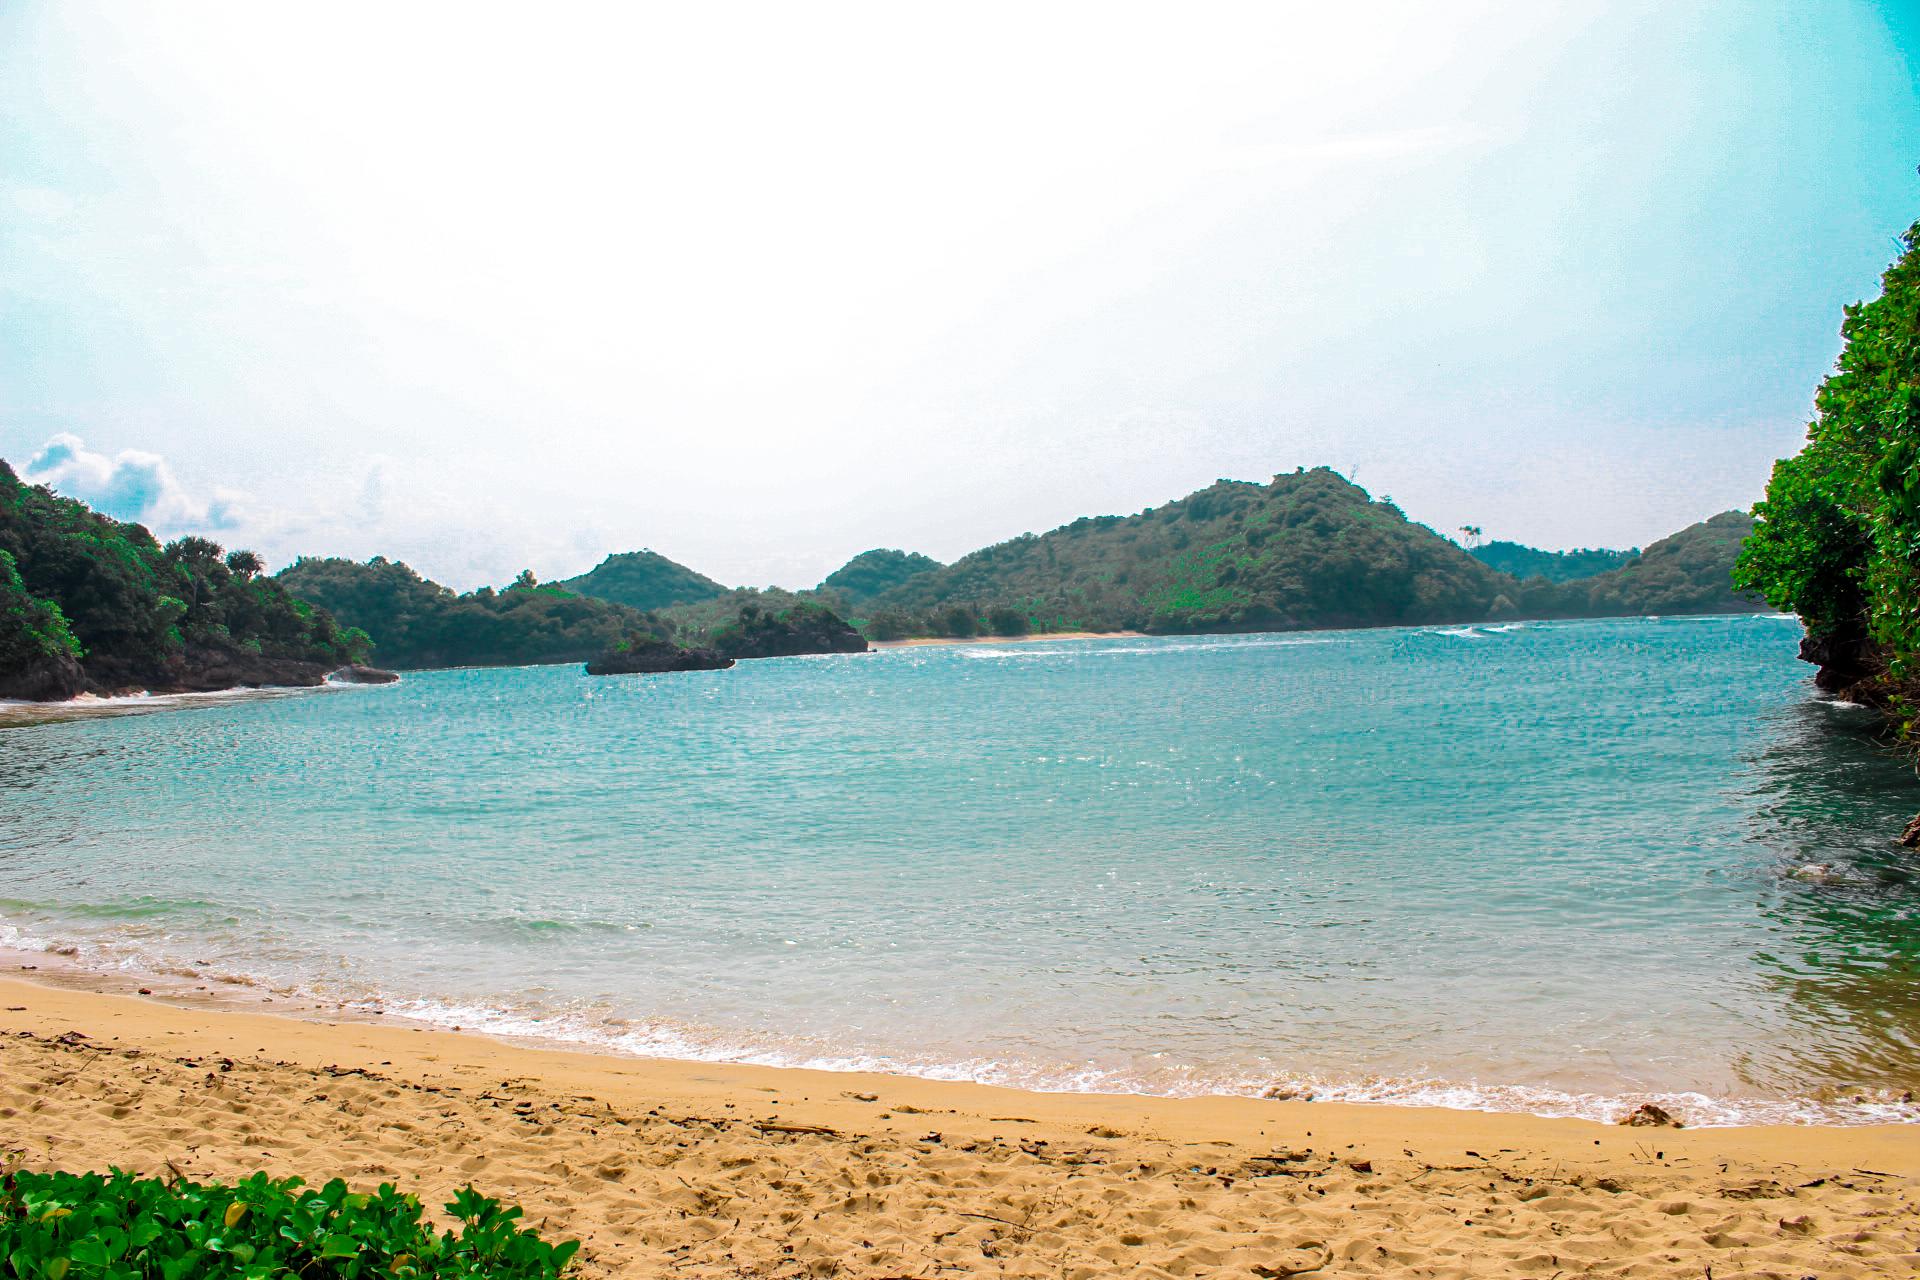 Zhafira Trans Travel Malang Juanda Pantai Clungup Sebuah Pesisir Selatan